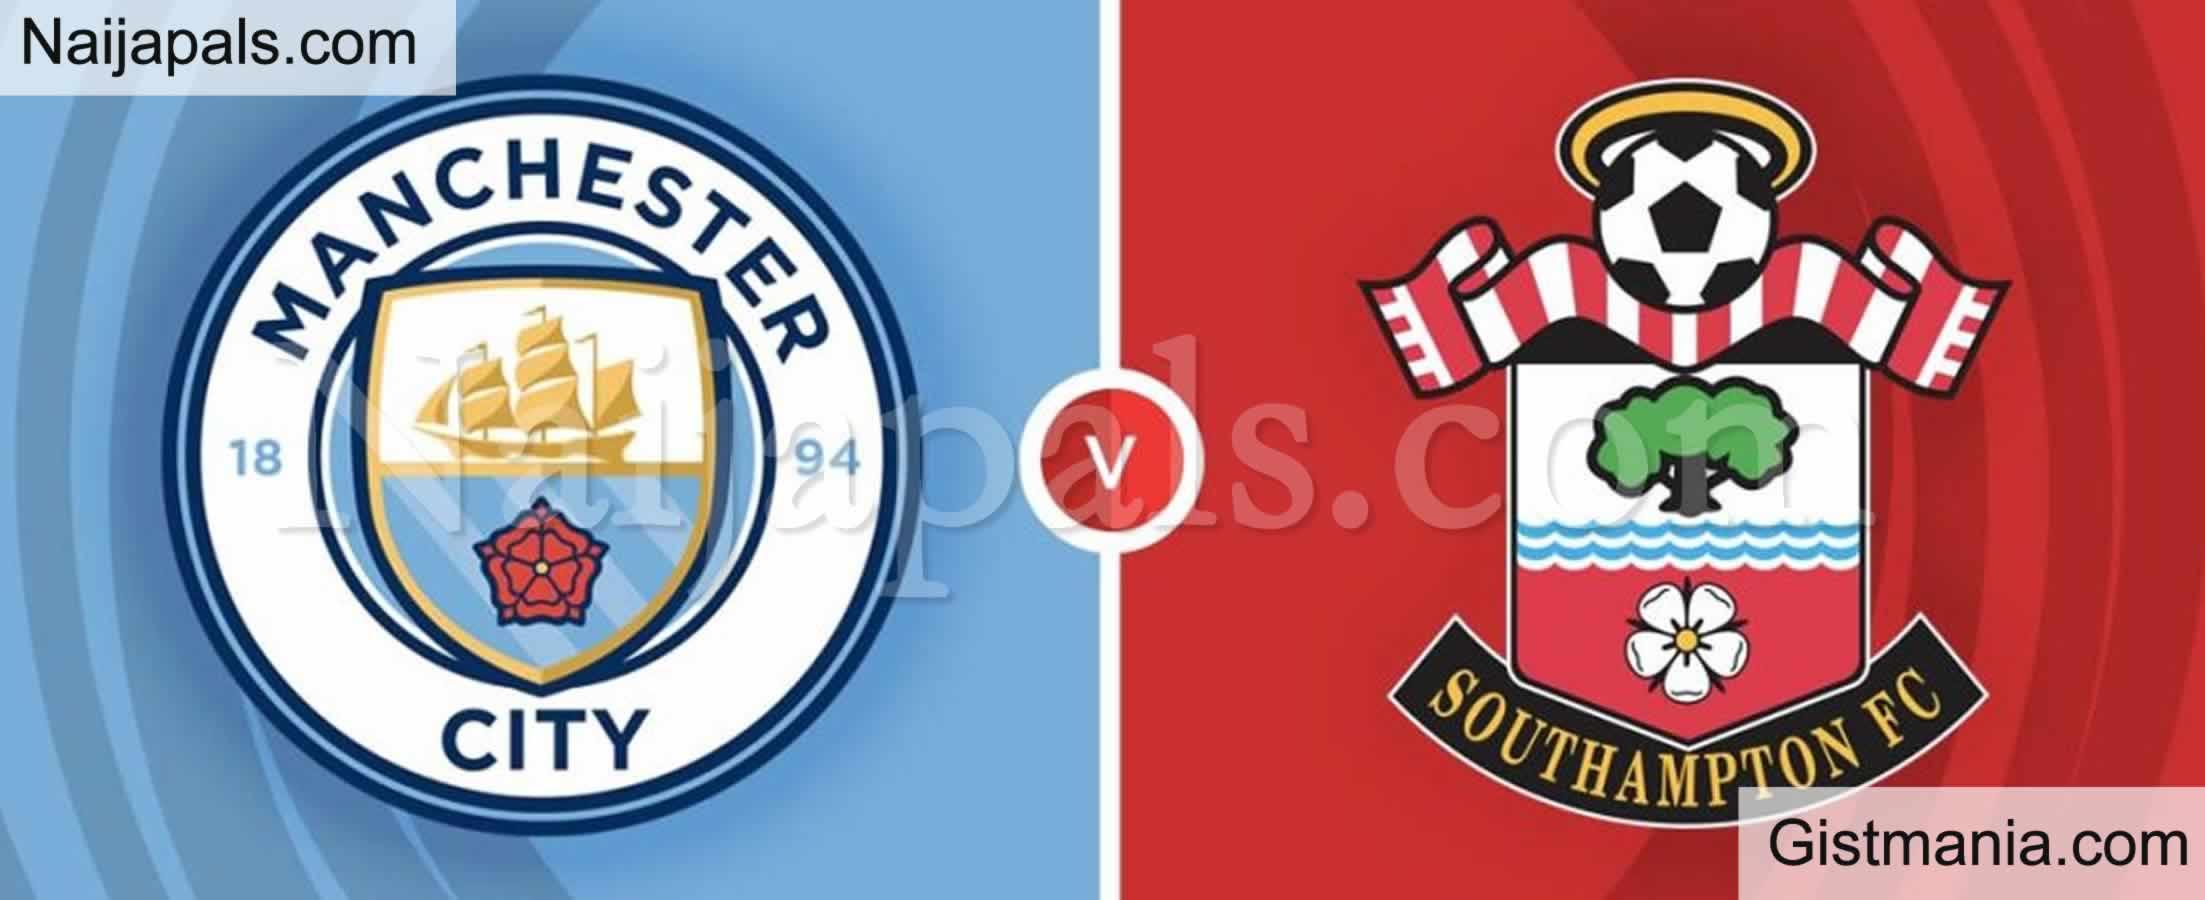 <img alt='.' class='lazyload' data-src='https://img.gistmania.com/emot/soccer.gif' /> <b>Manchester City v Southampton : English Premier League Match, Team News, Goal Scorers and Stats</b>